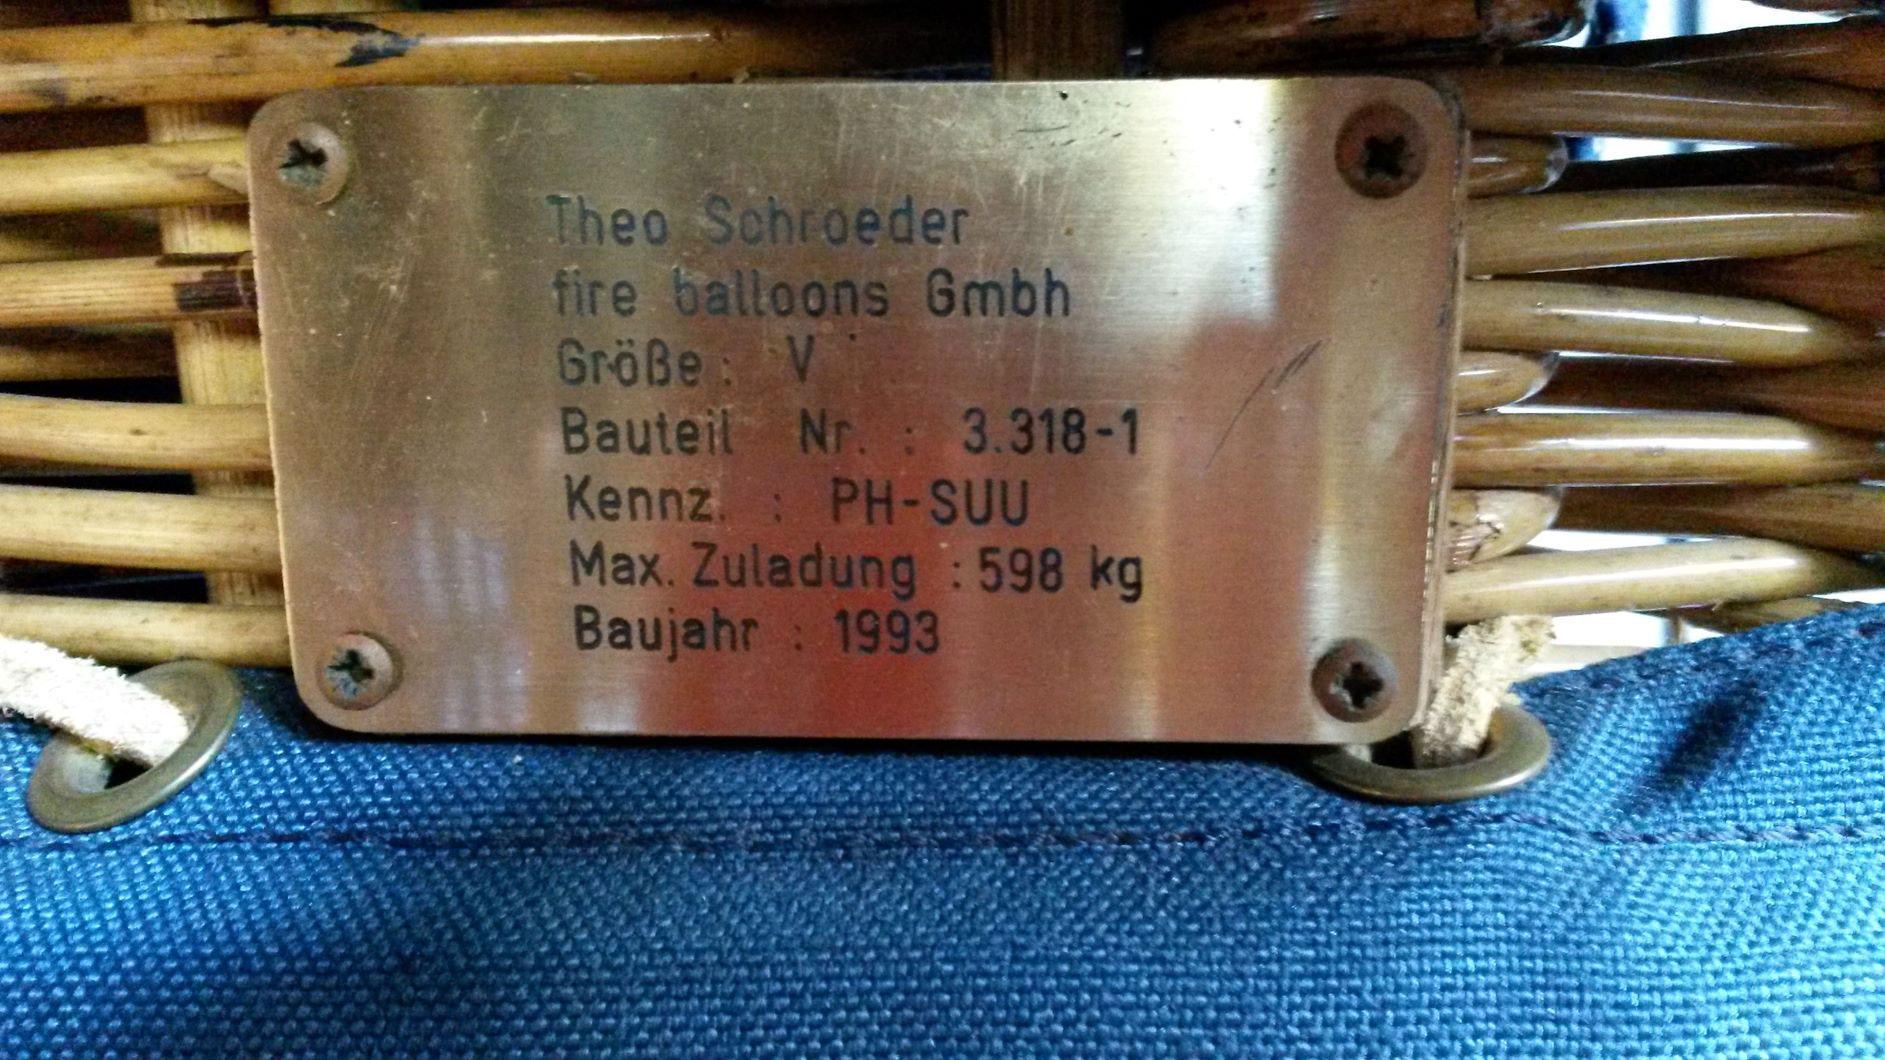 PH-SUU Schroeder Fire Balloons G 36/24